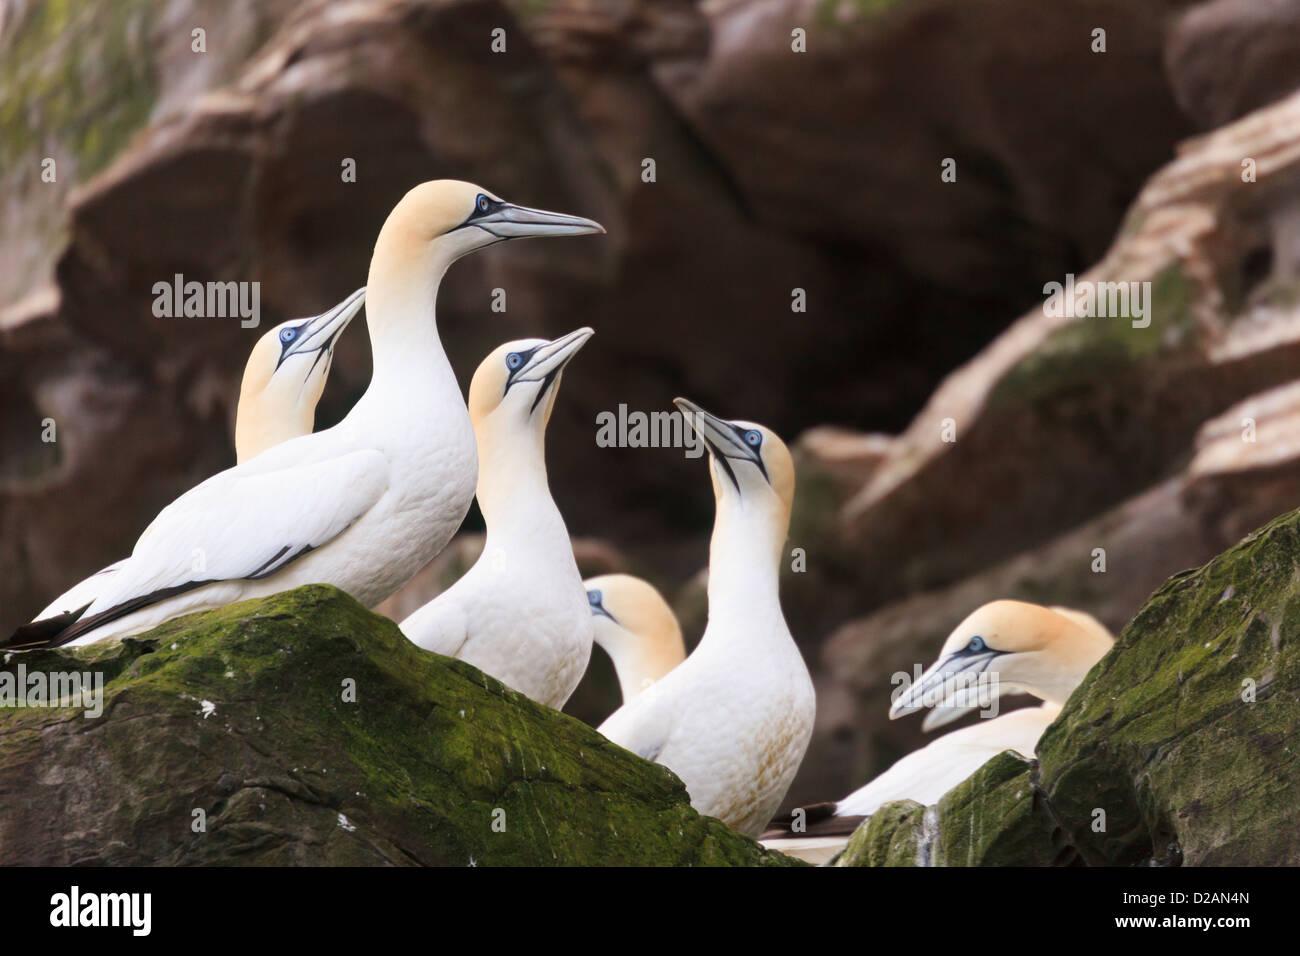 Basstölpel Vögel nisten auf felsigen Seeklippen auf Isle of Noss National Nature Reserve im Sommer Brutzeit. Stockbild